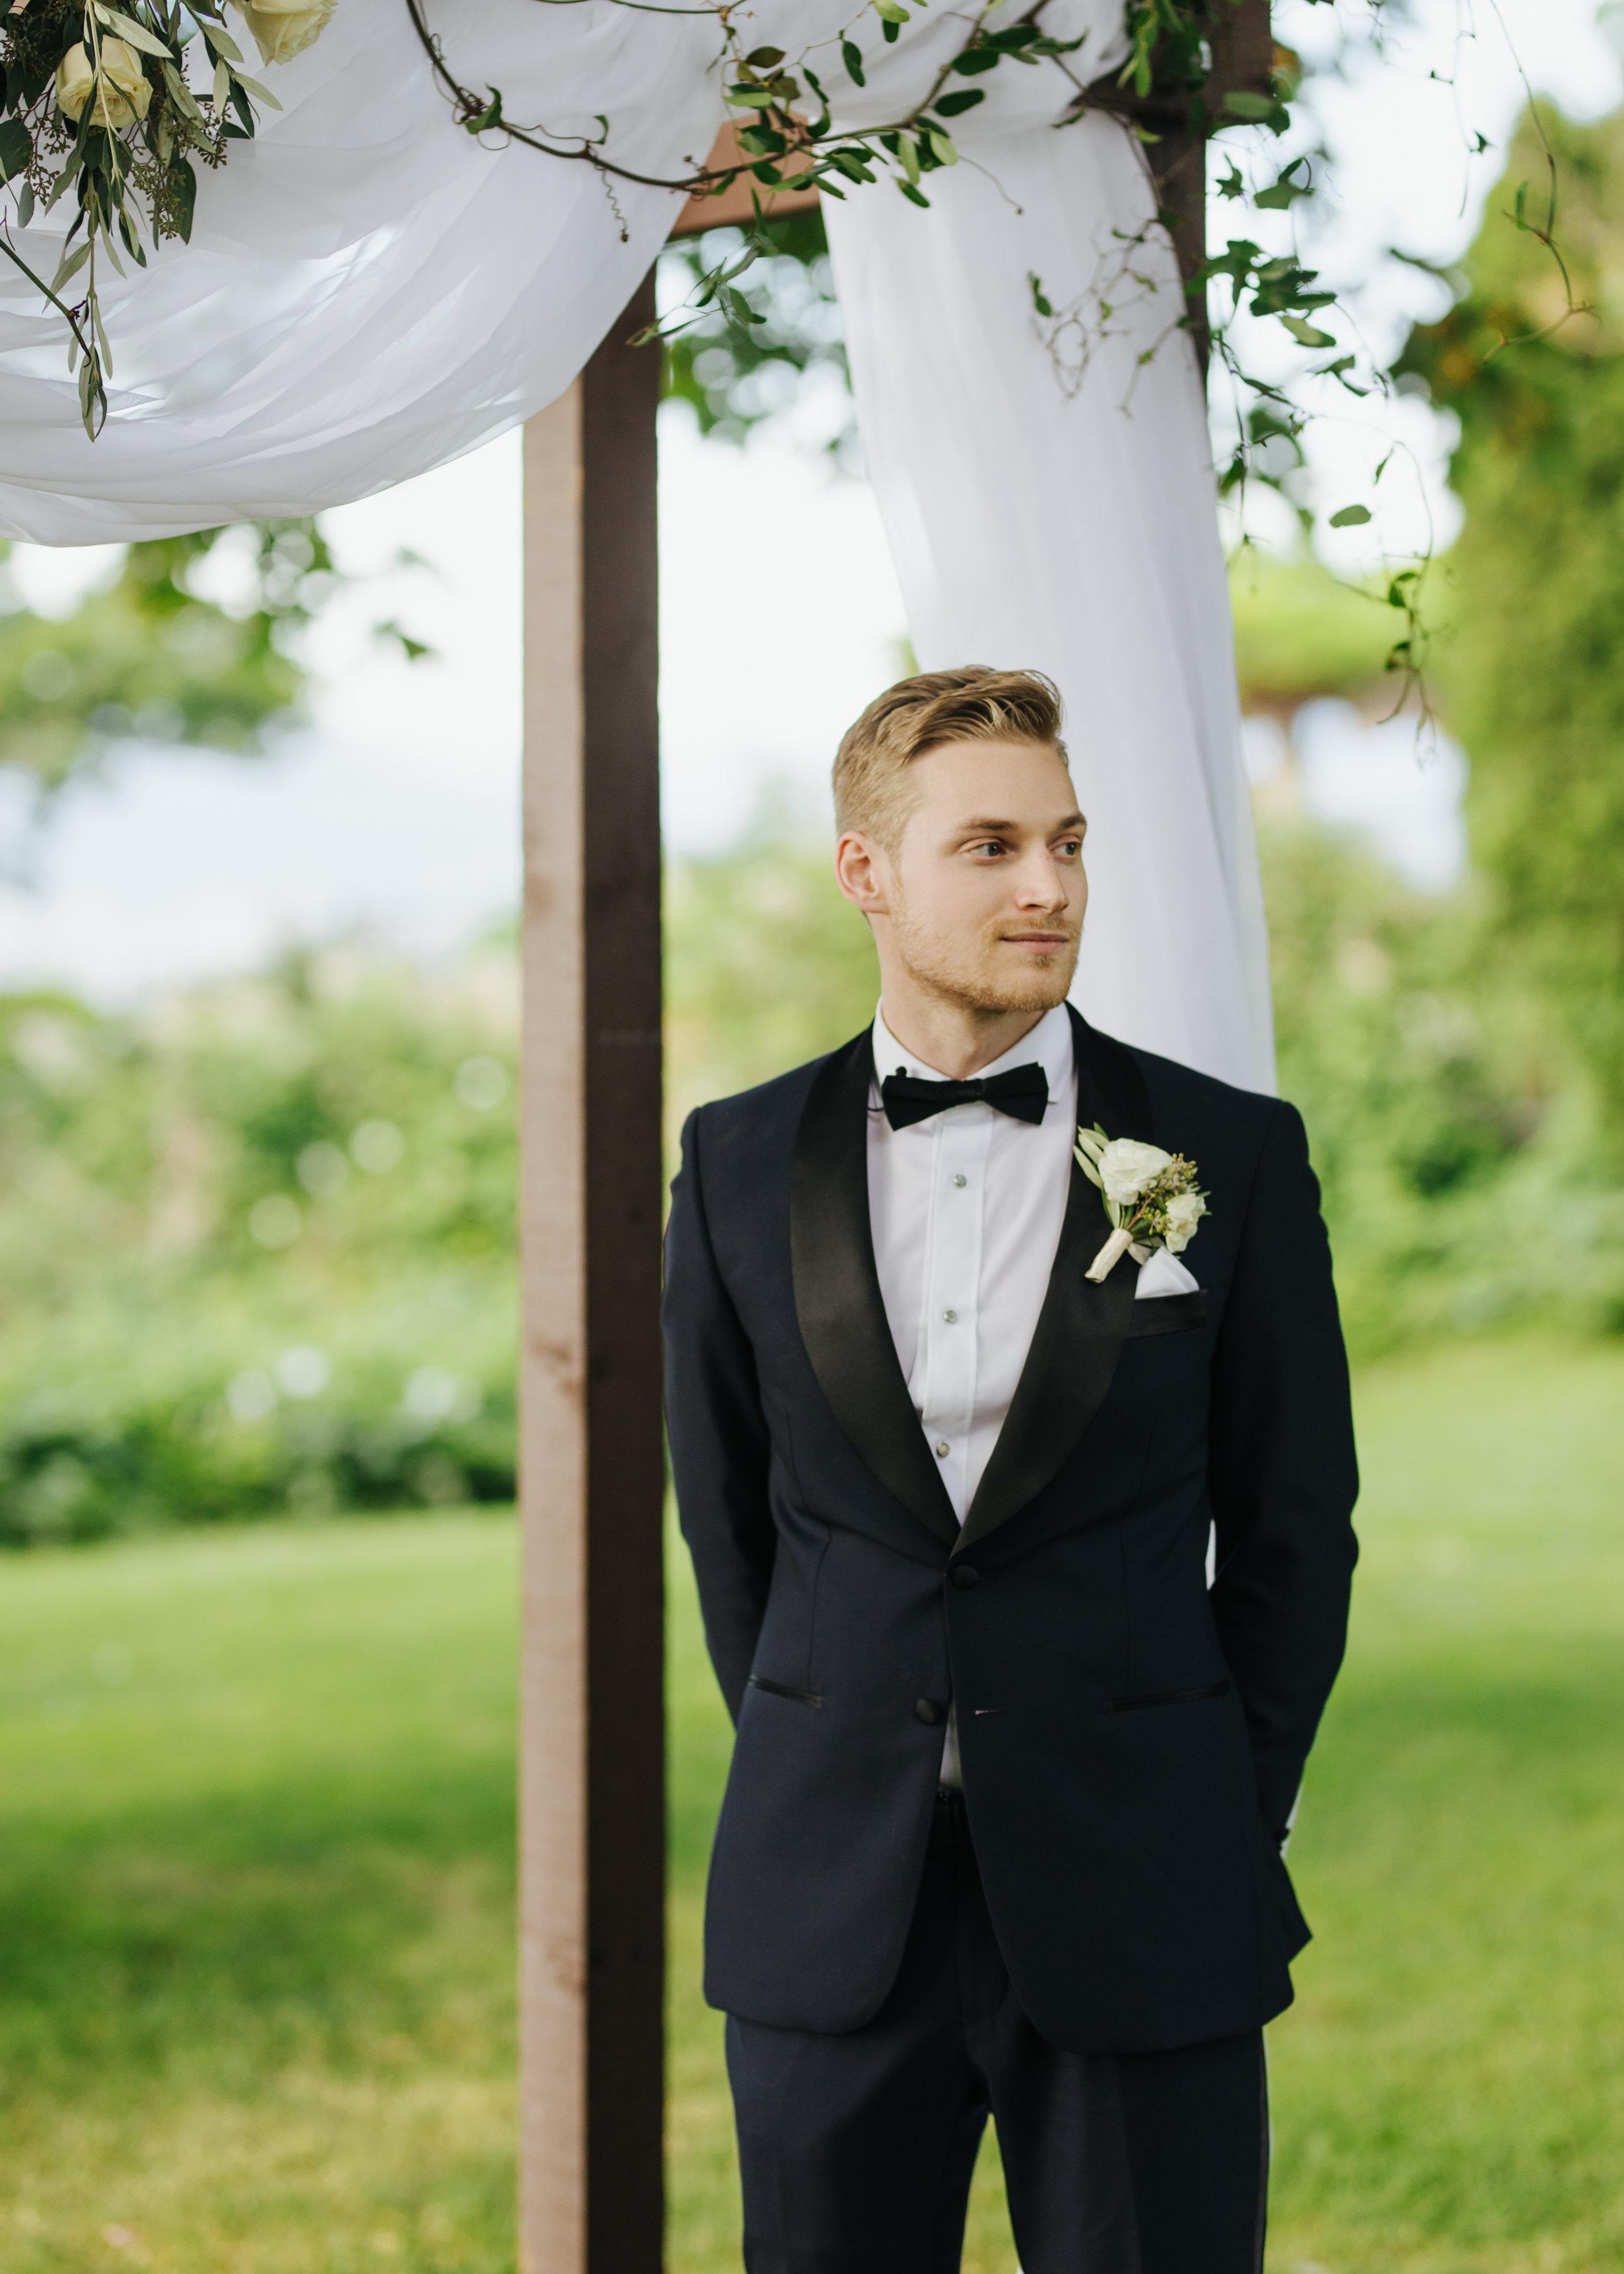 herastudios_wedding_sadaf_logan_hera_selects-39.jpg